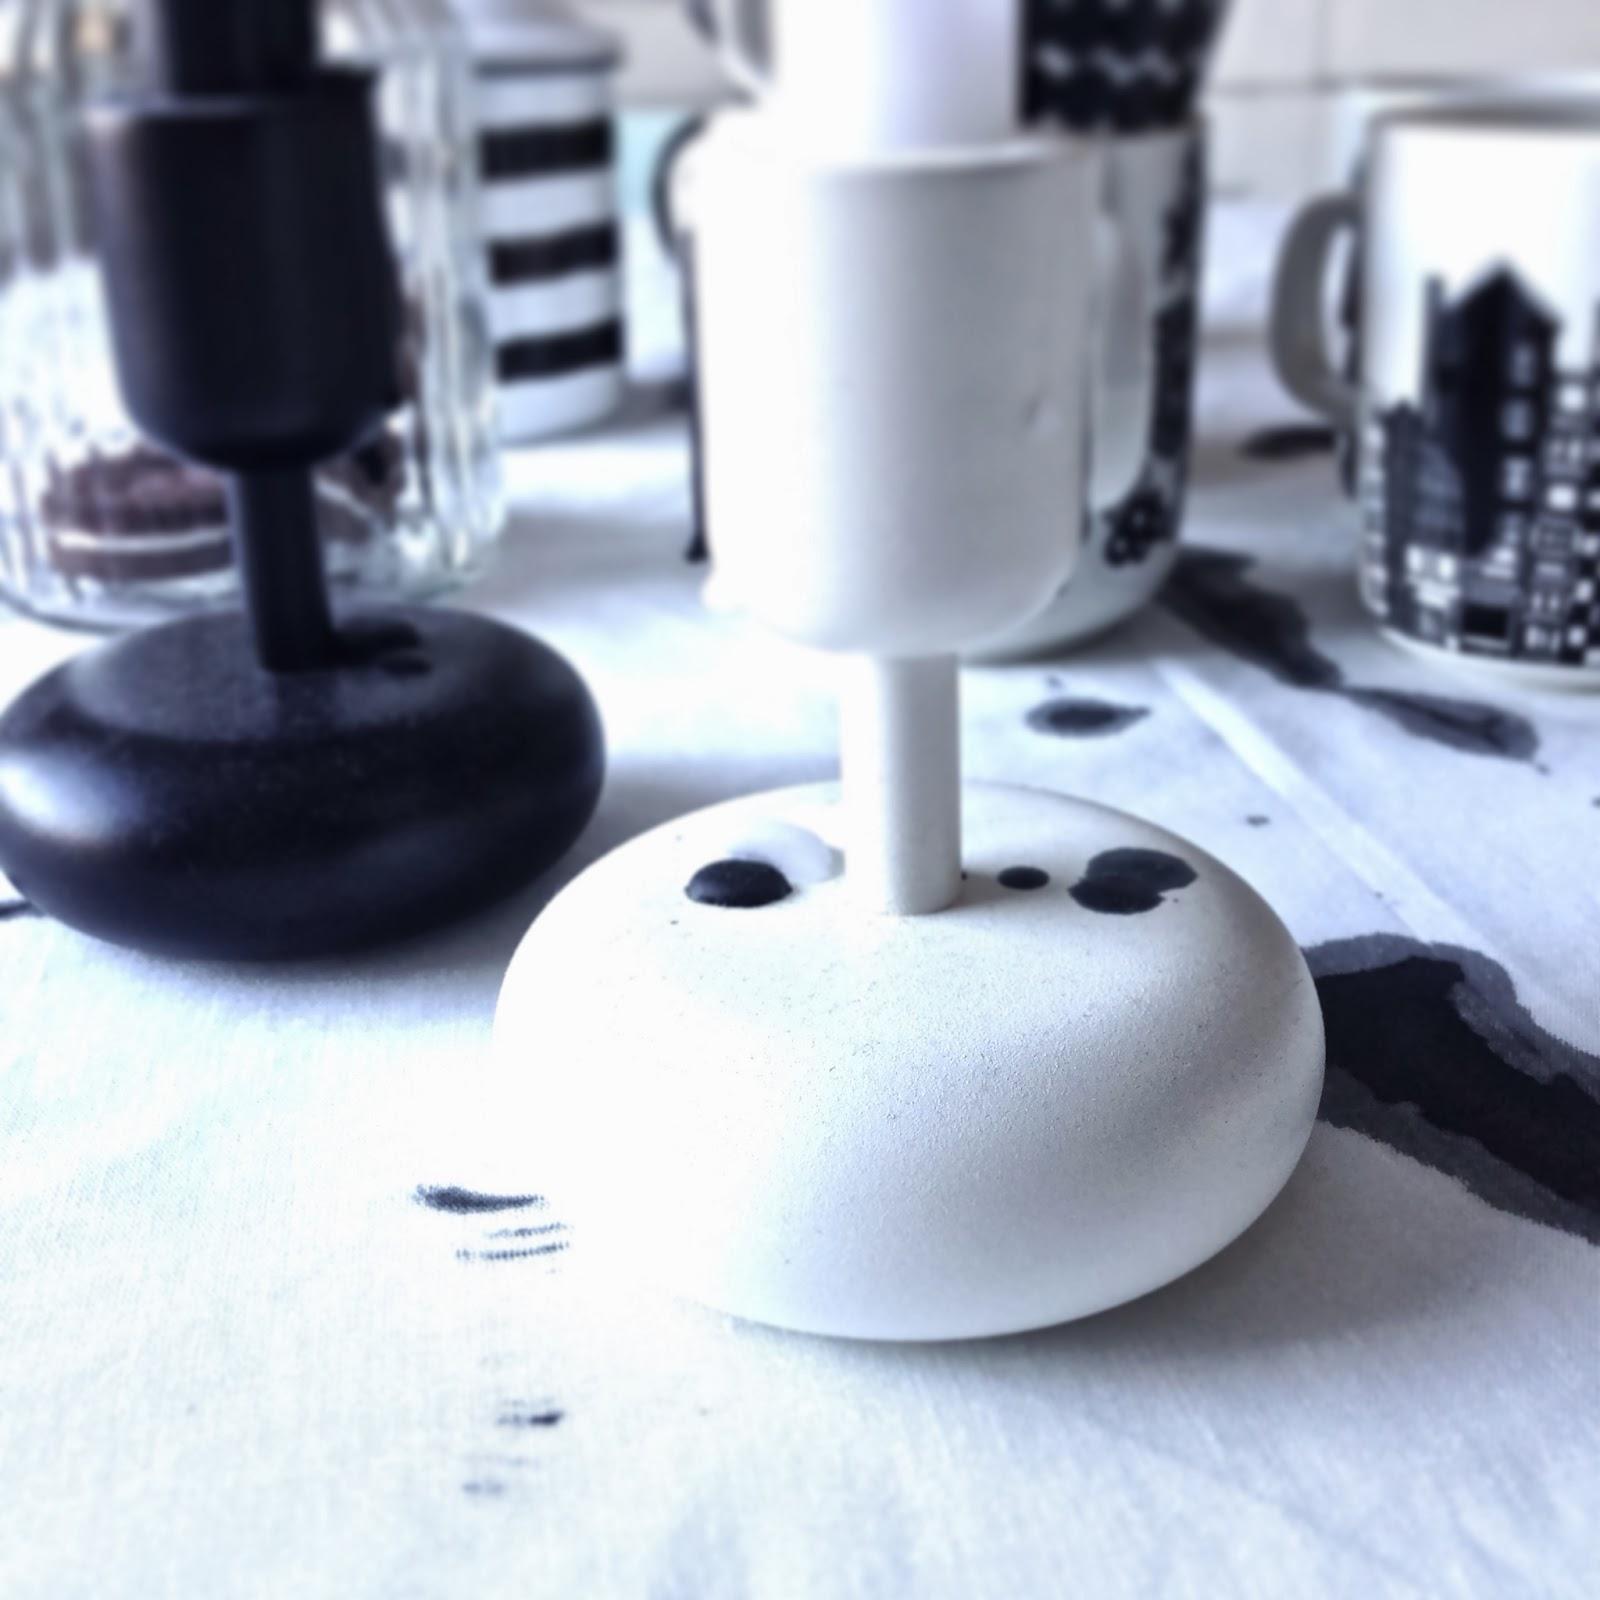 DIY, bordduk, pöytäliina, table cloth